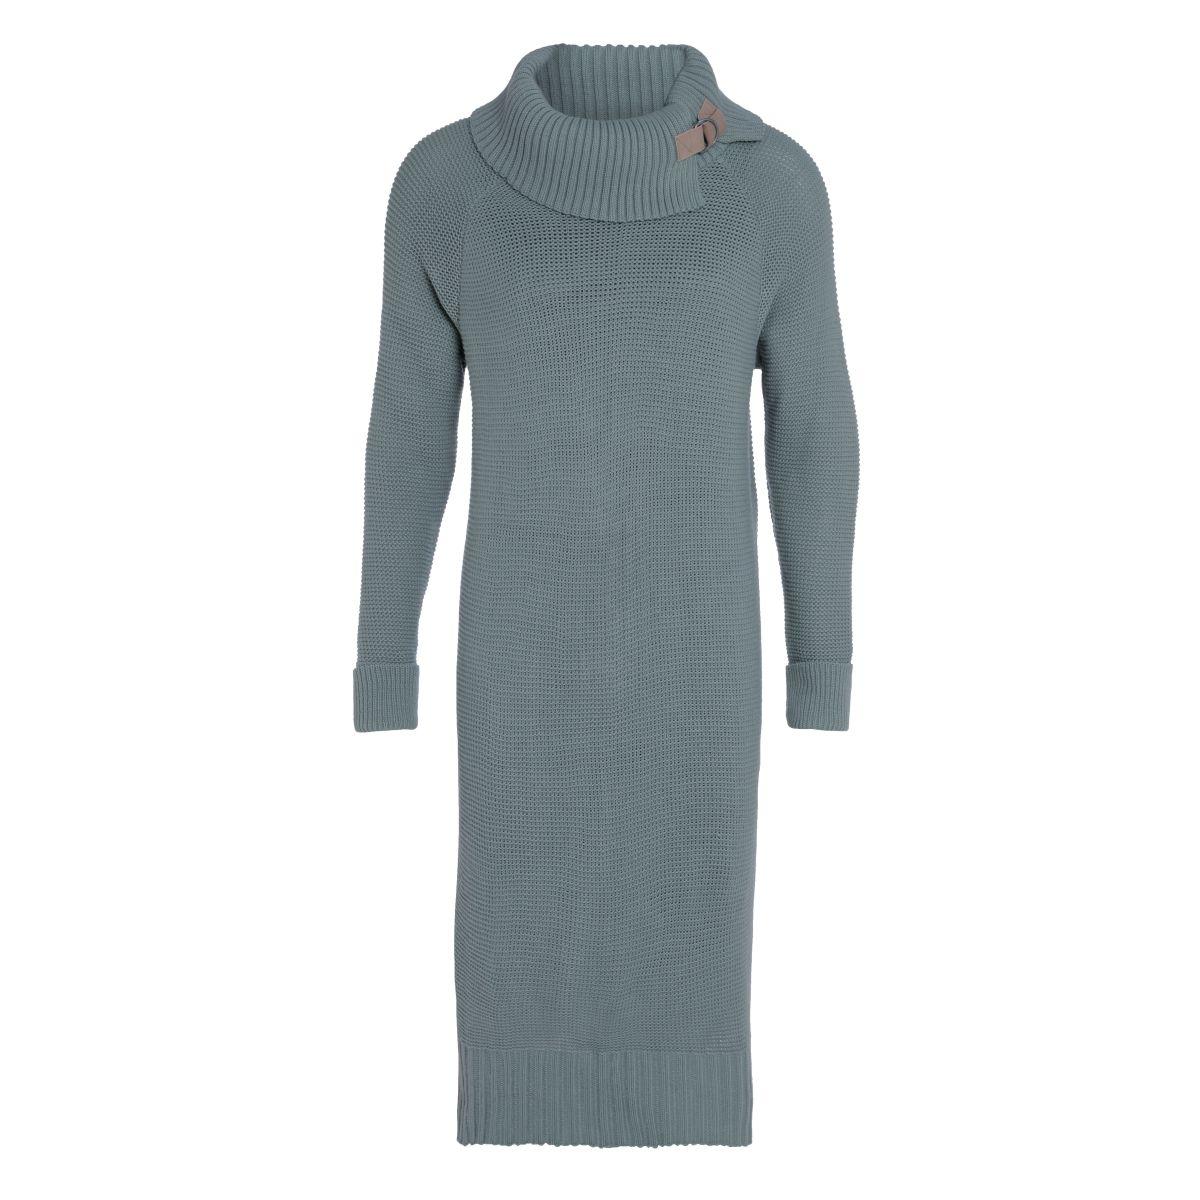 jamie gebreide jurk stone green 3638